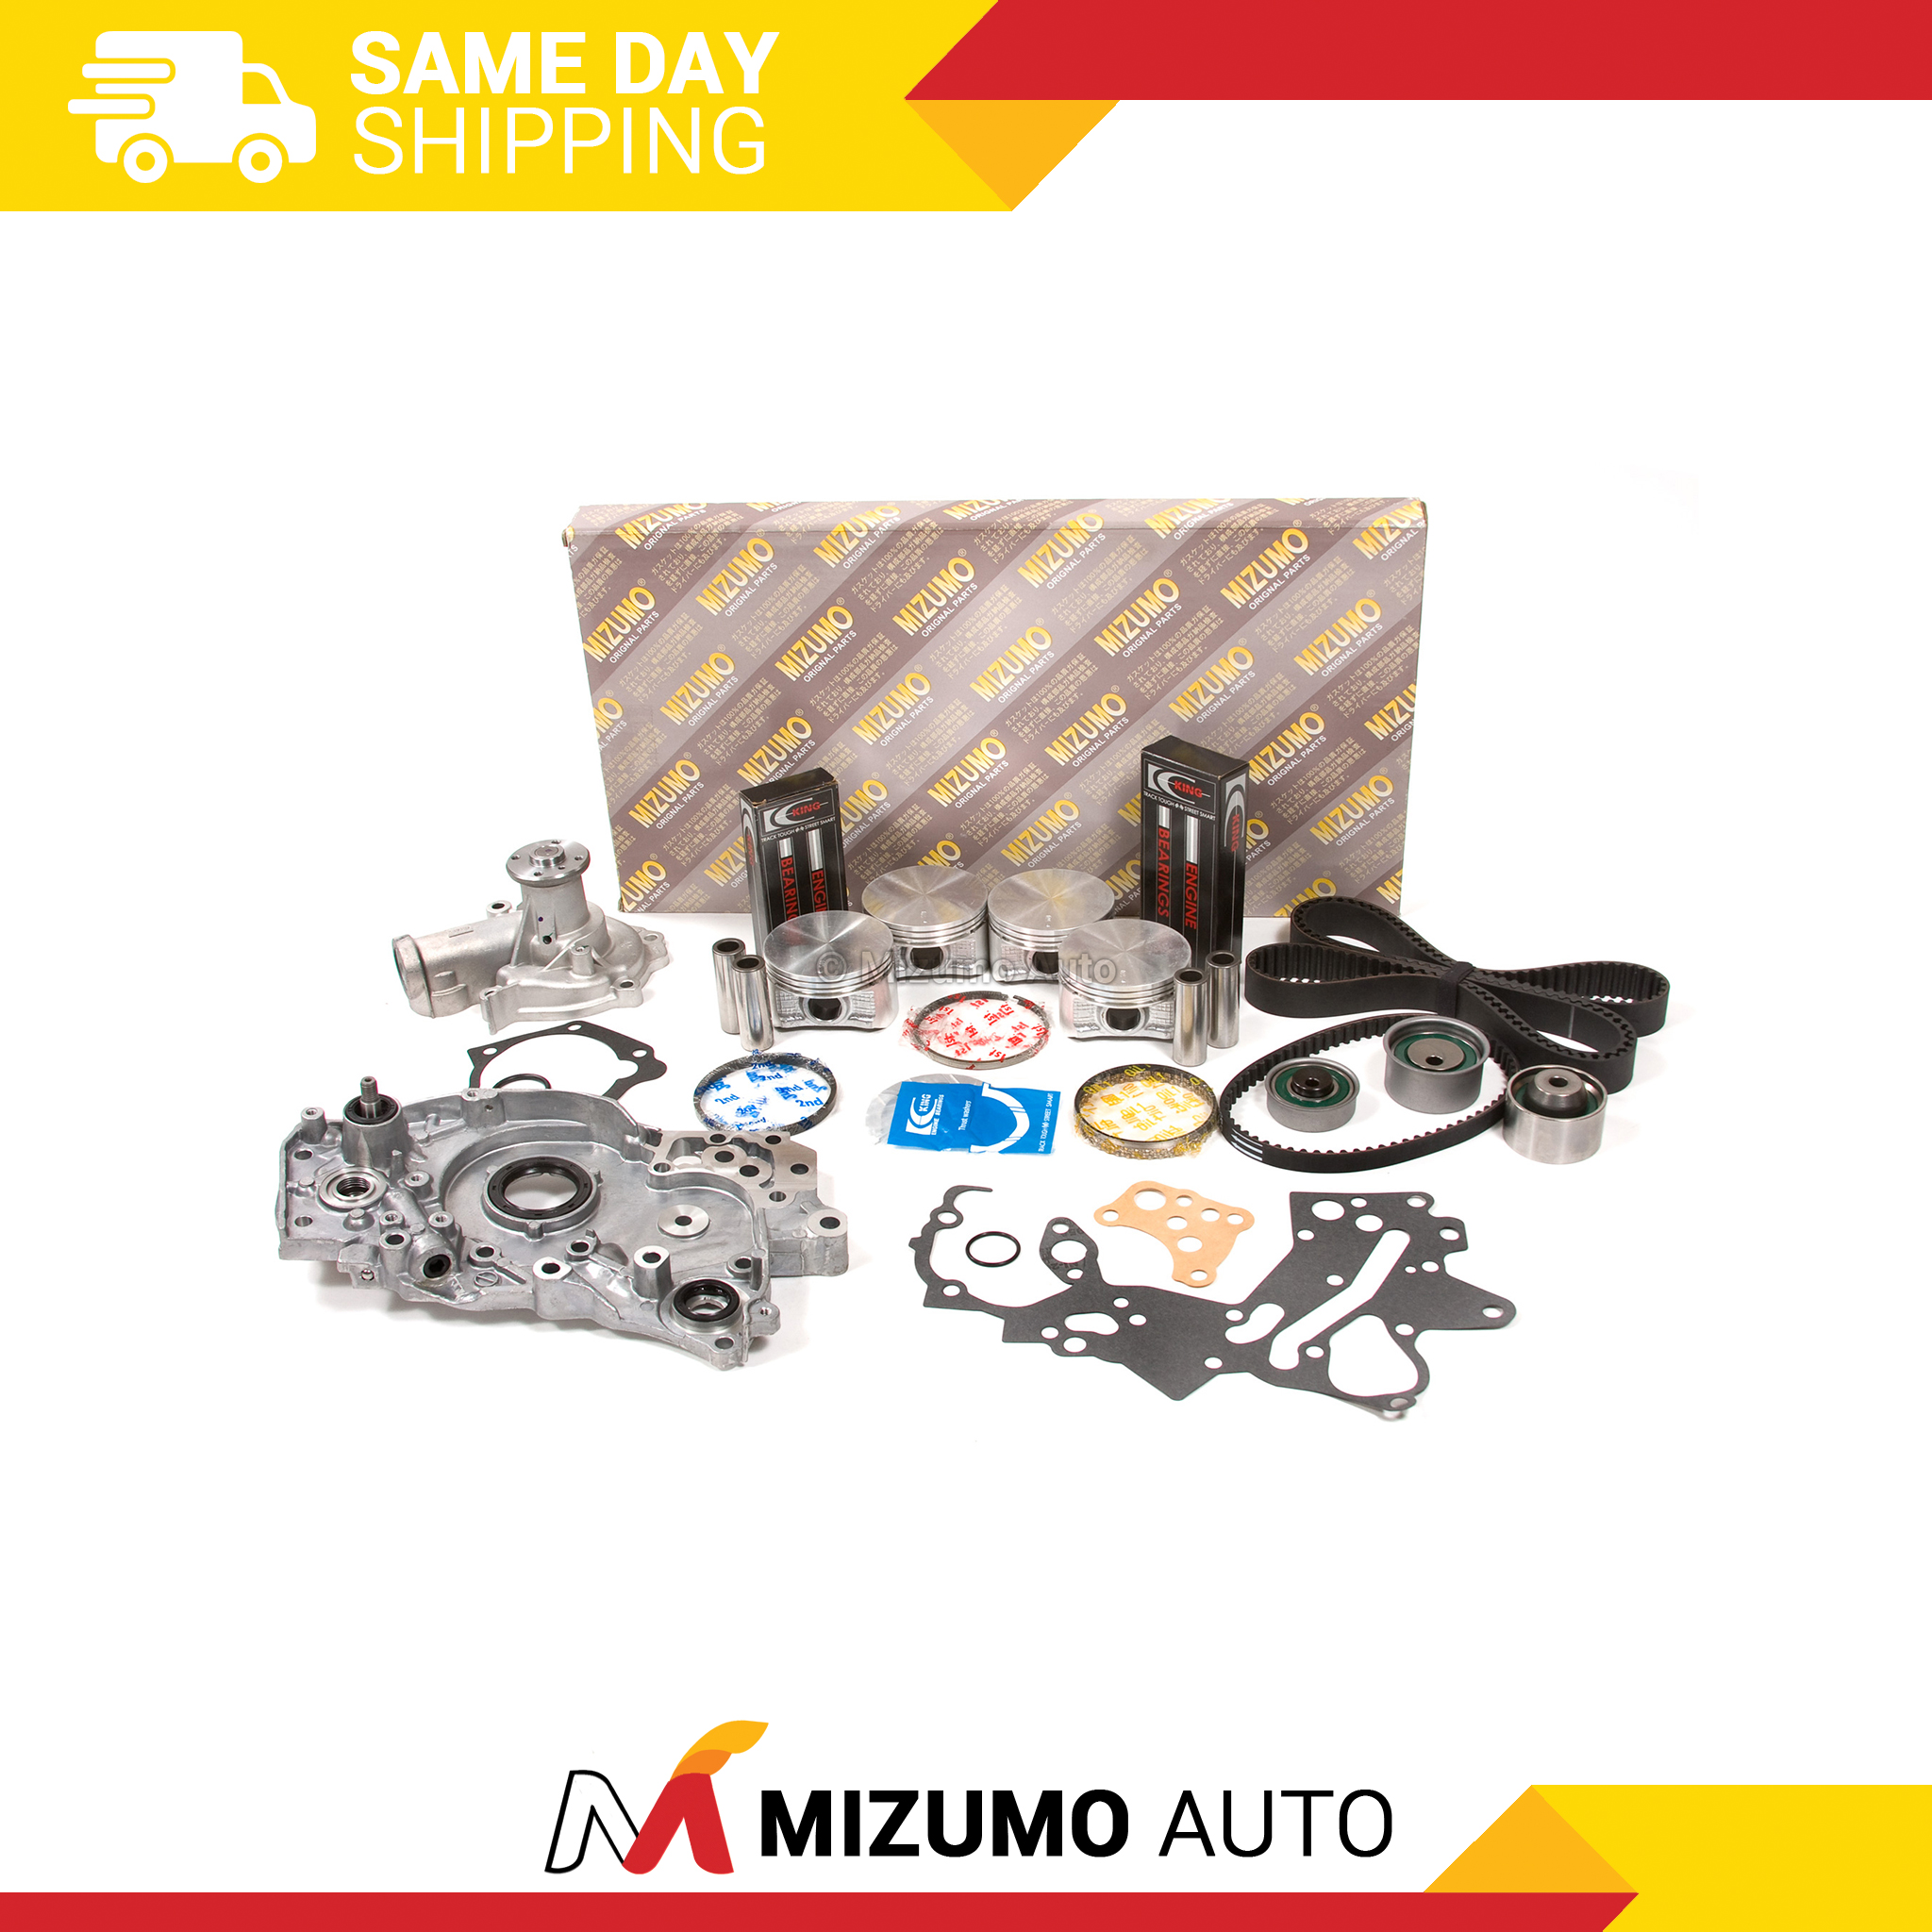 Mitsubishi Eclipse 2000 Remanufactured Complete: Engine Rebuild Kit Fit 99-05 Mitsubishi Eclipse Galant